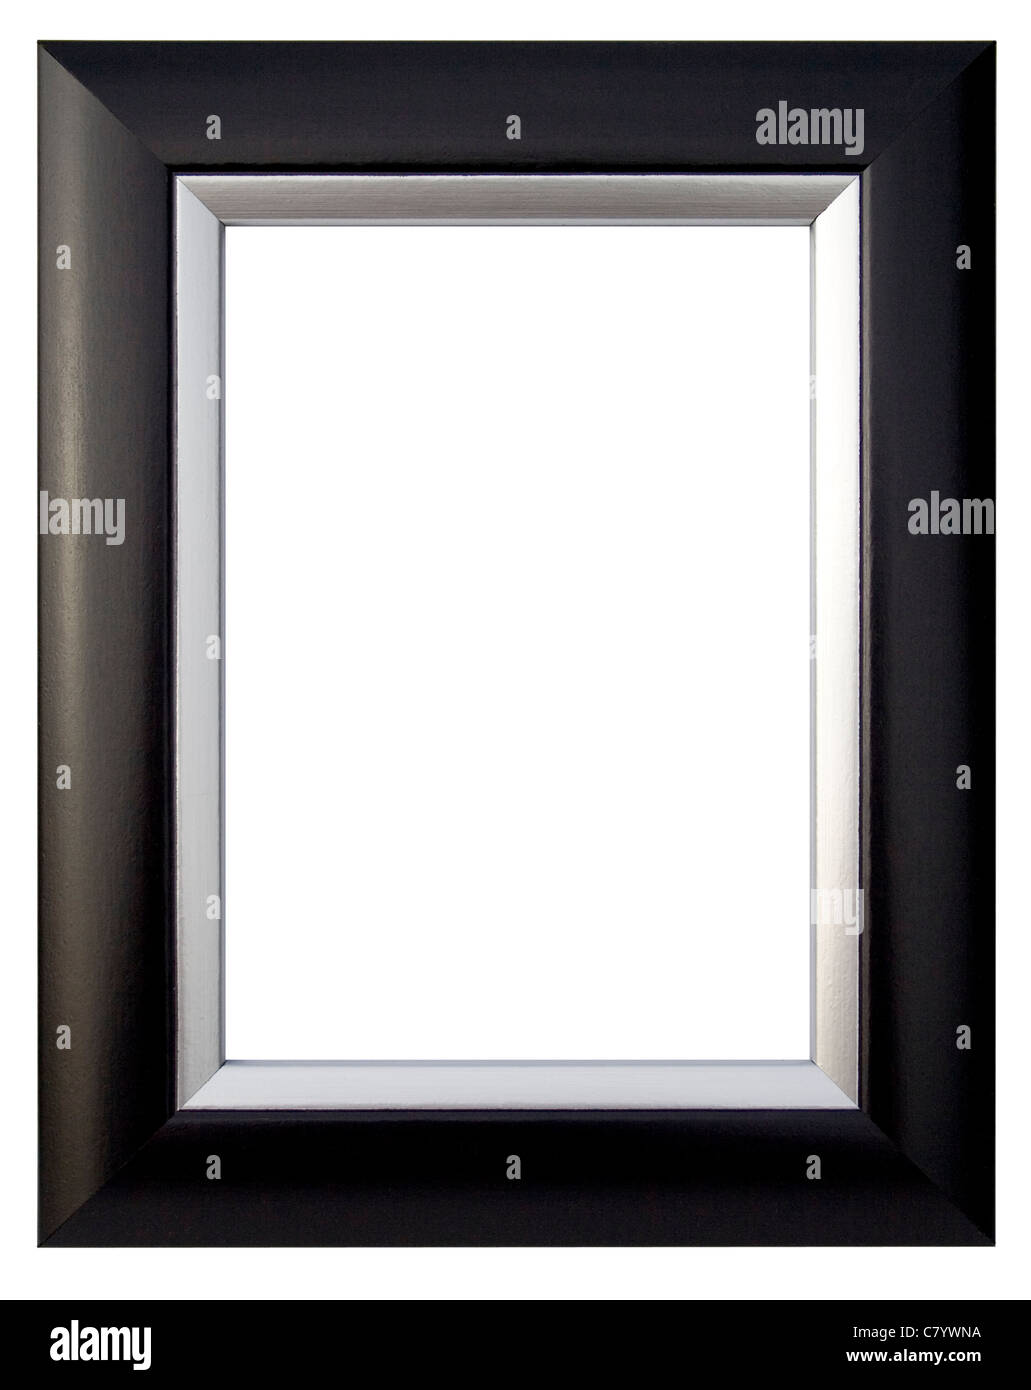 Photo Frame Stockfotos & Photo Frame Bilder - Alamy